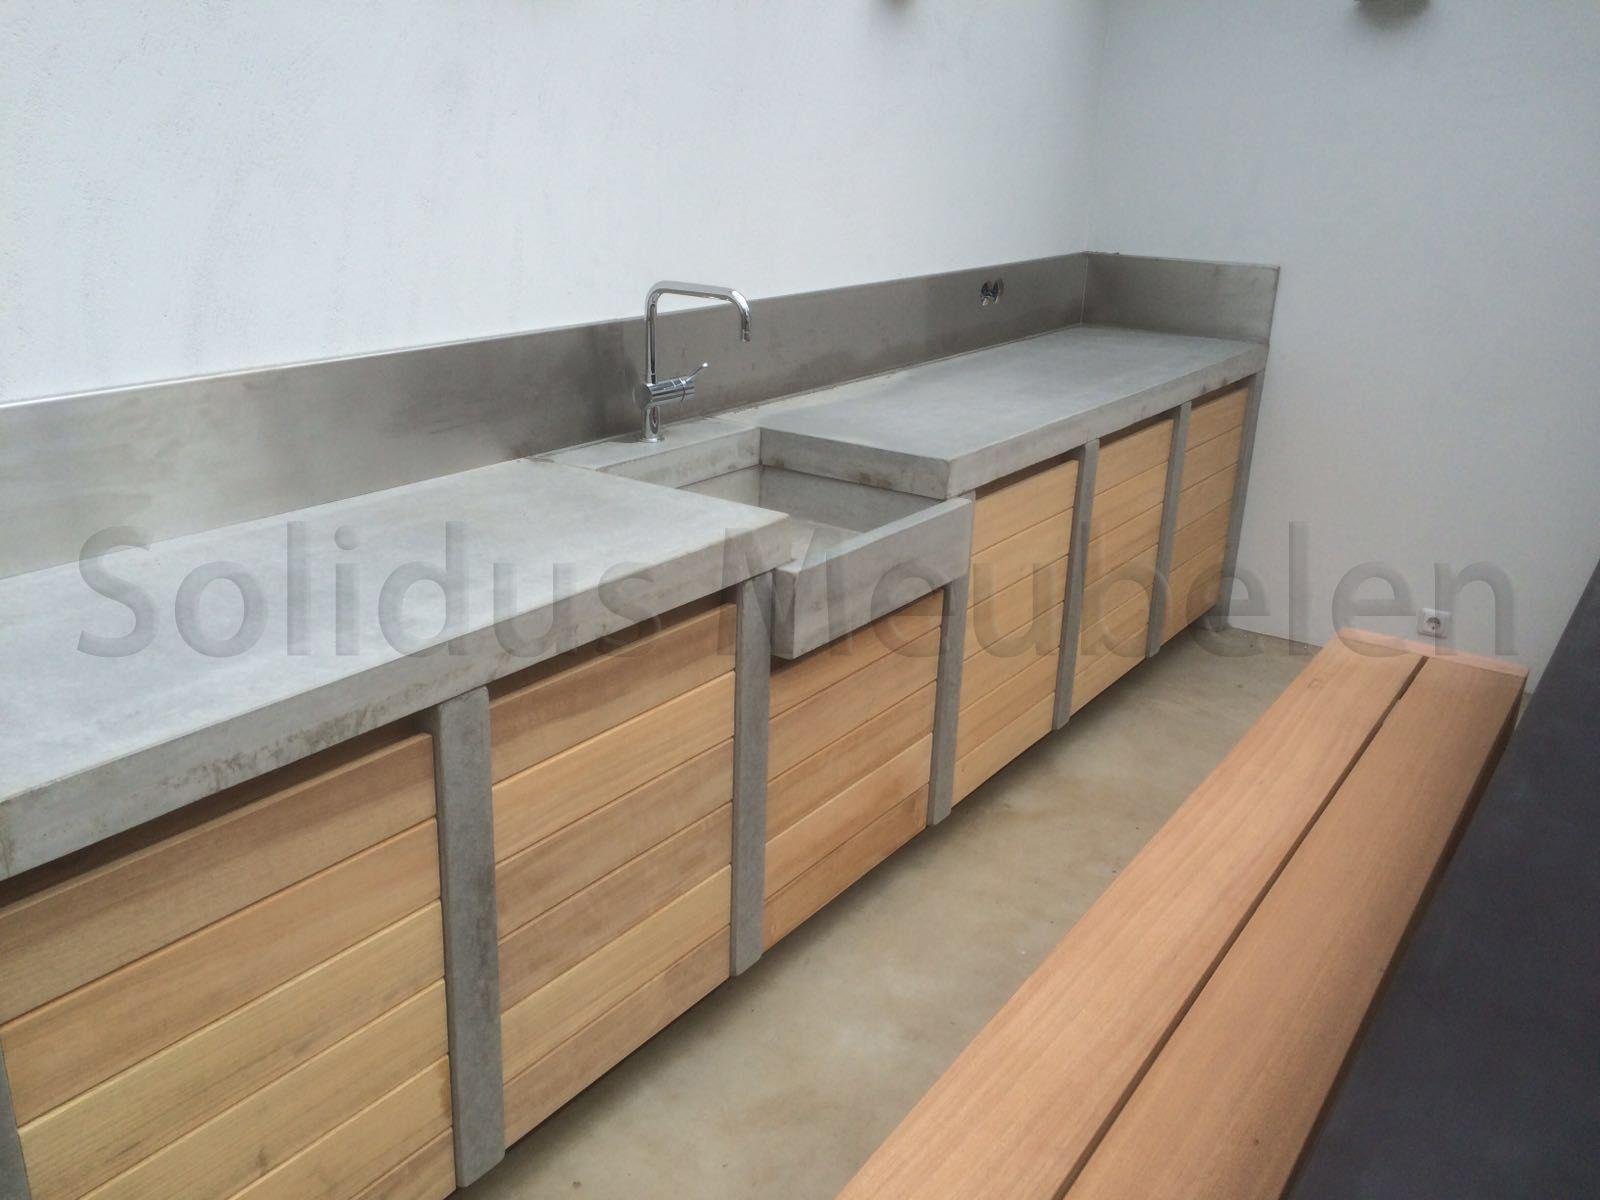 Hout En Beton : Luxe hout en beton schutting met rotsmotief